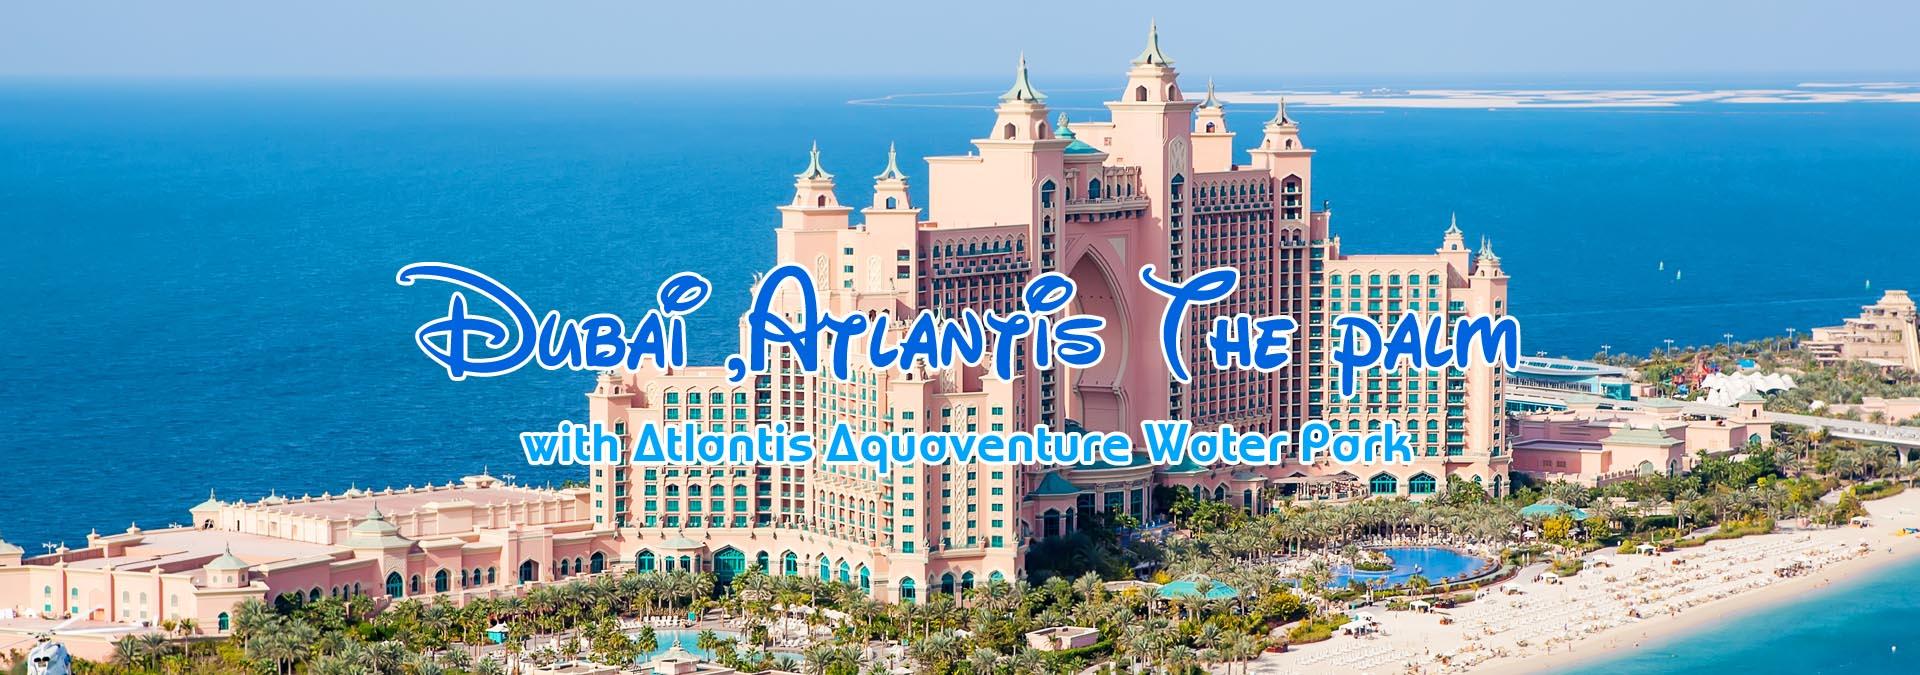 Dubai With Atlantis The Palm Sabsan Holidays